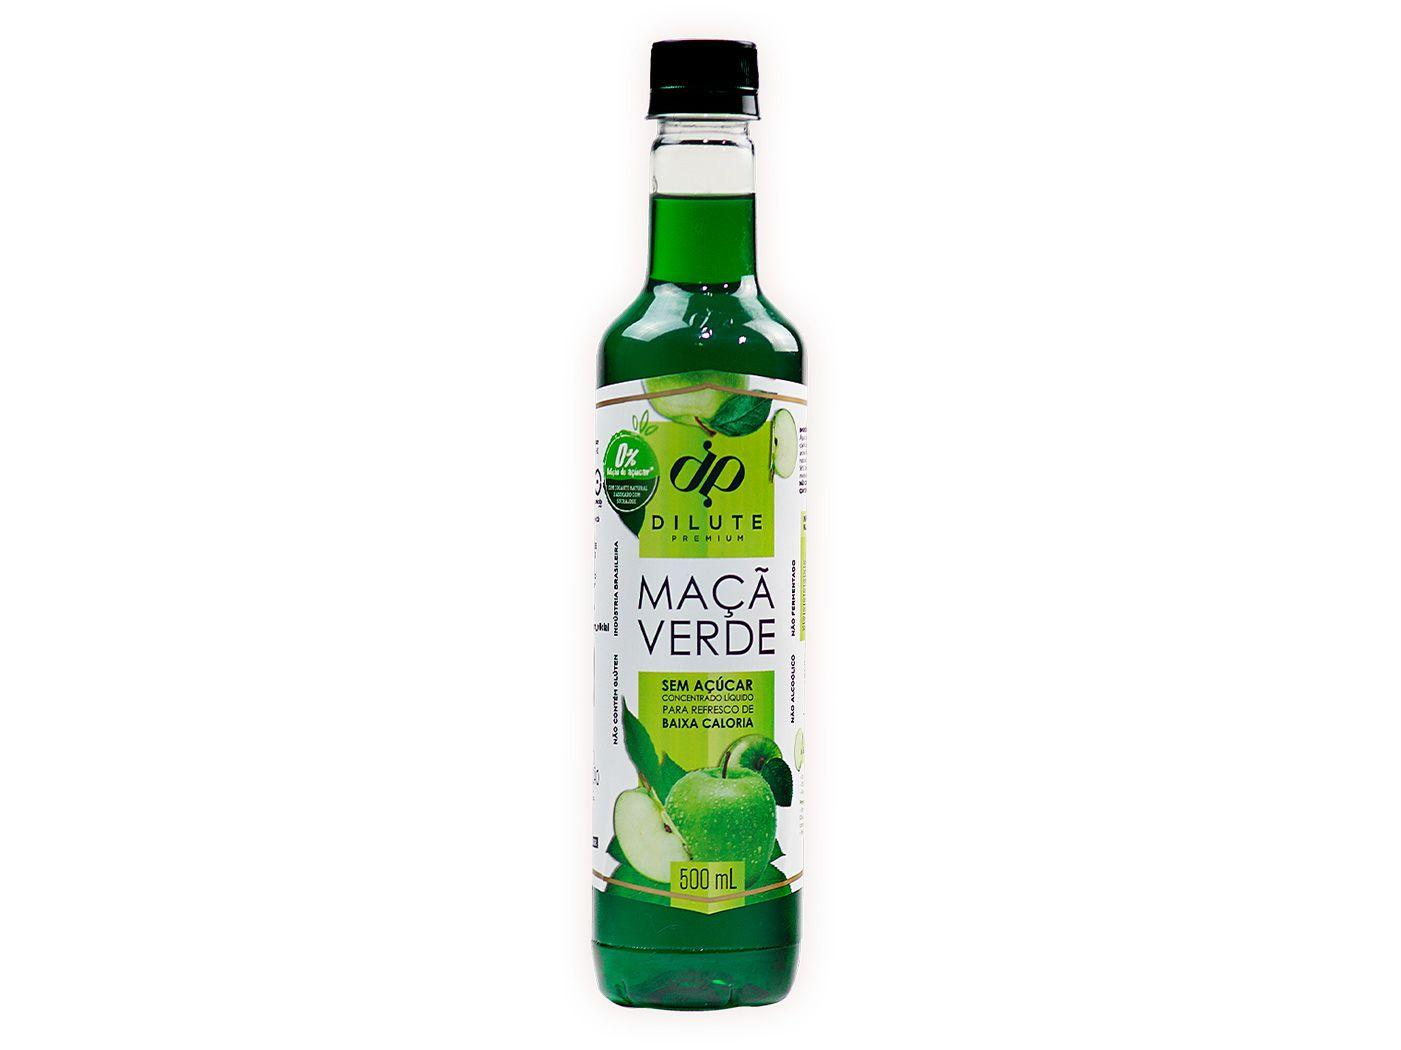 Xarope Dilute Premium Maçã Verde Sem Açúcar 500ml